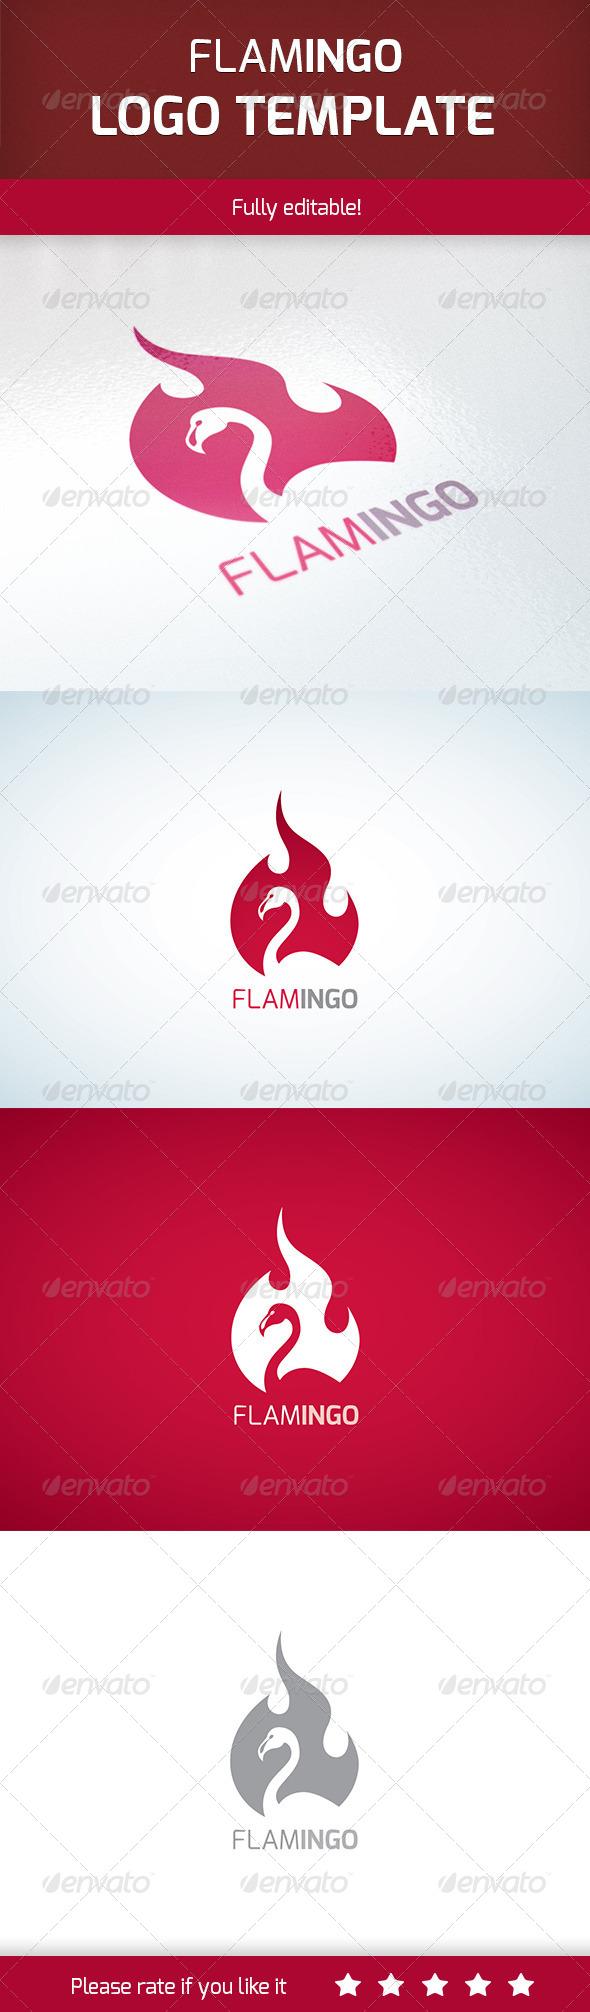 Flamingo - Logo Templates